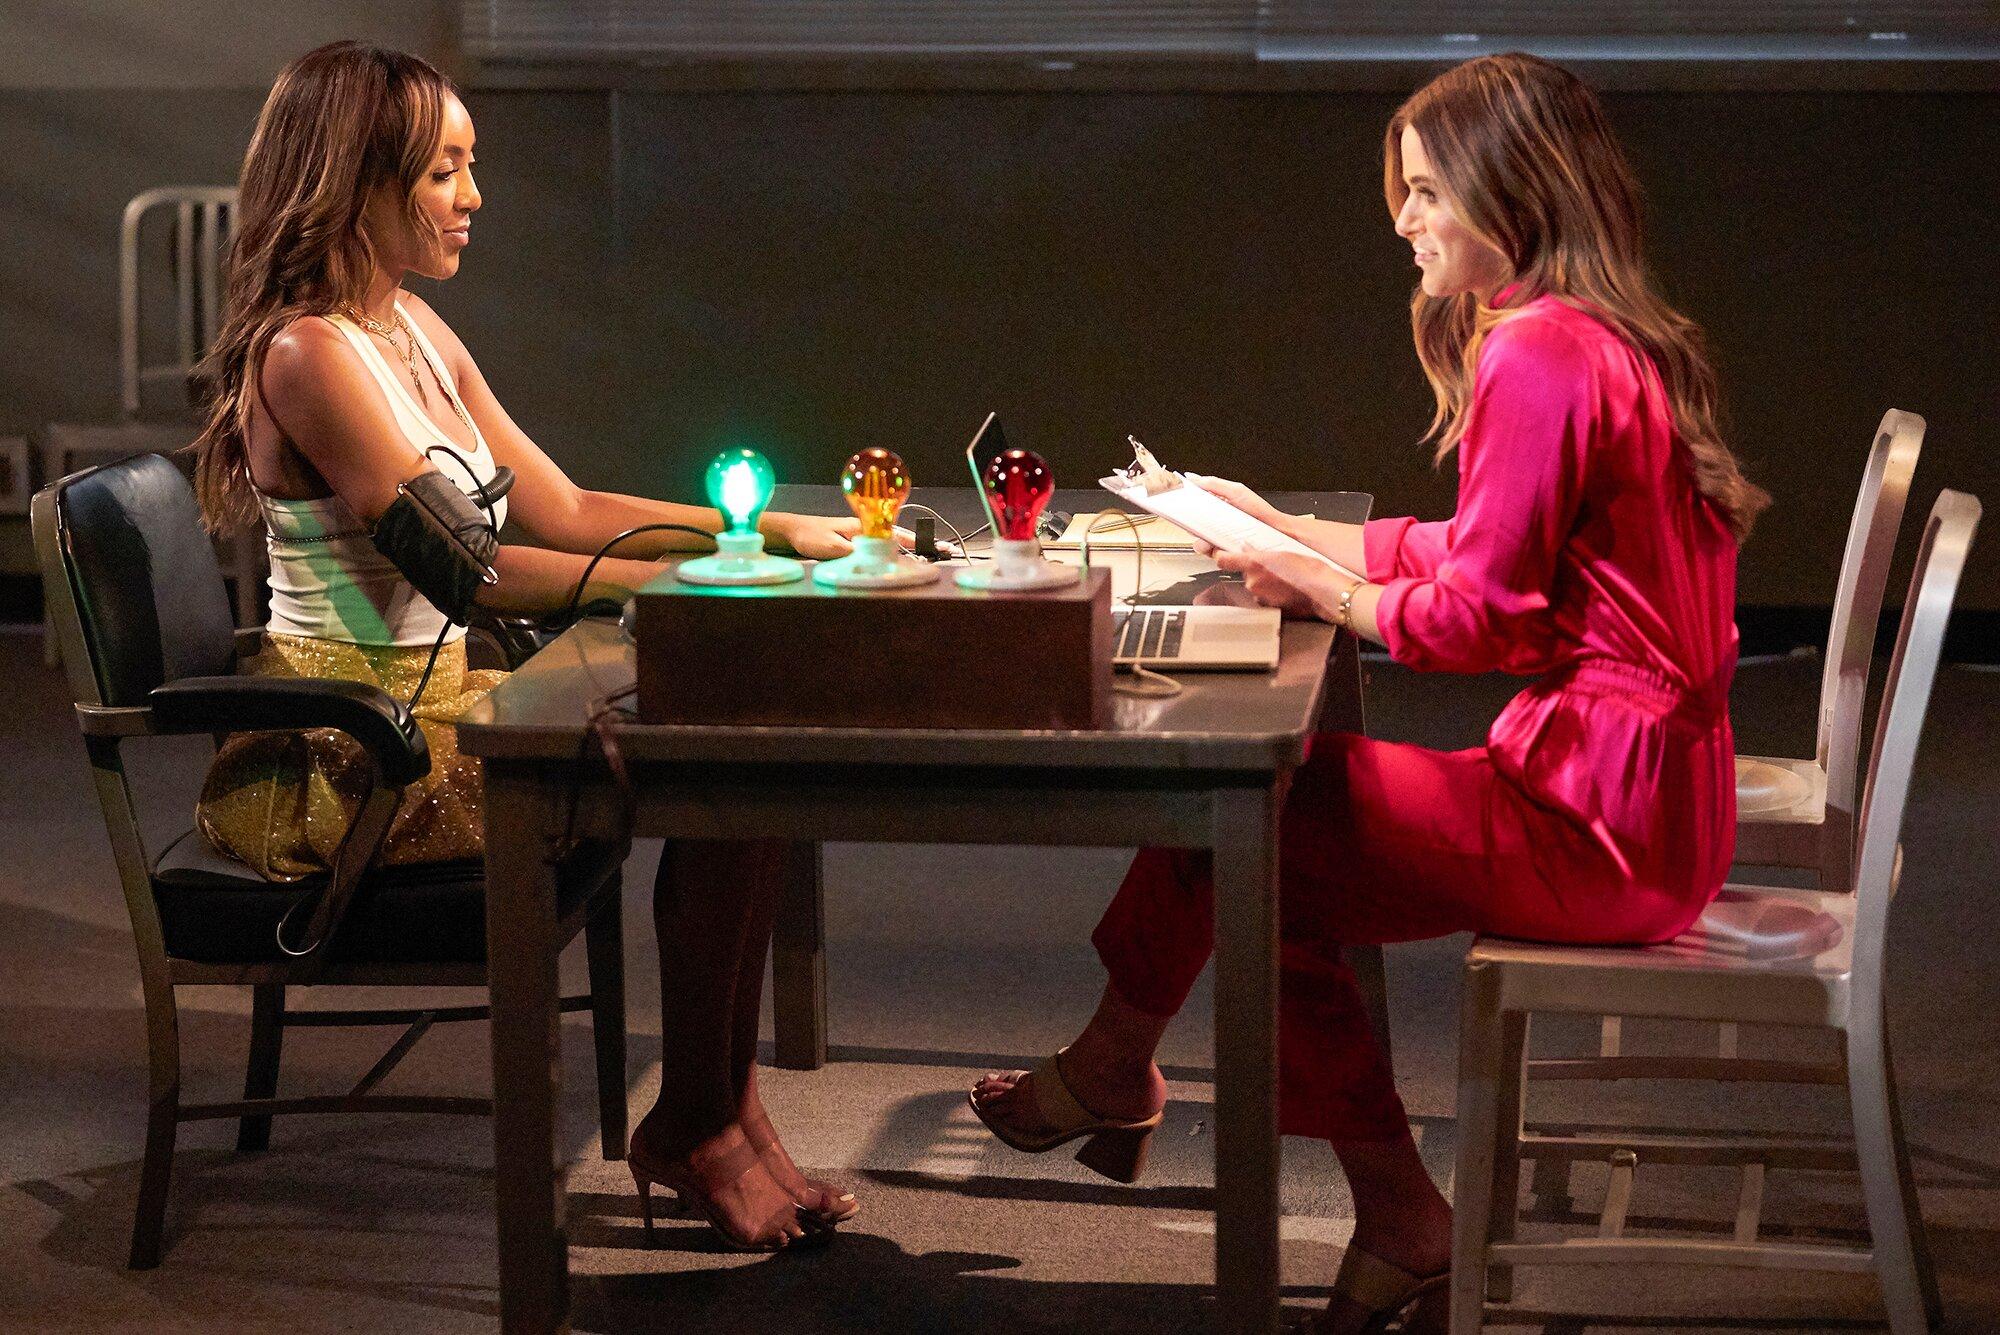 The Bachelorette season 16, episode 9 recap: To tell the truth | EW.com